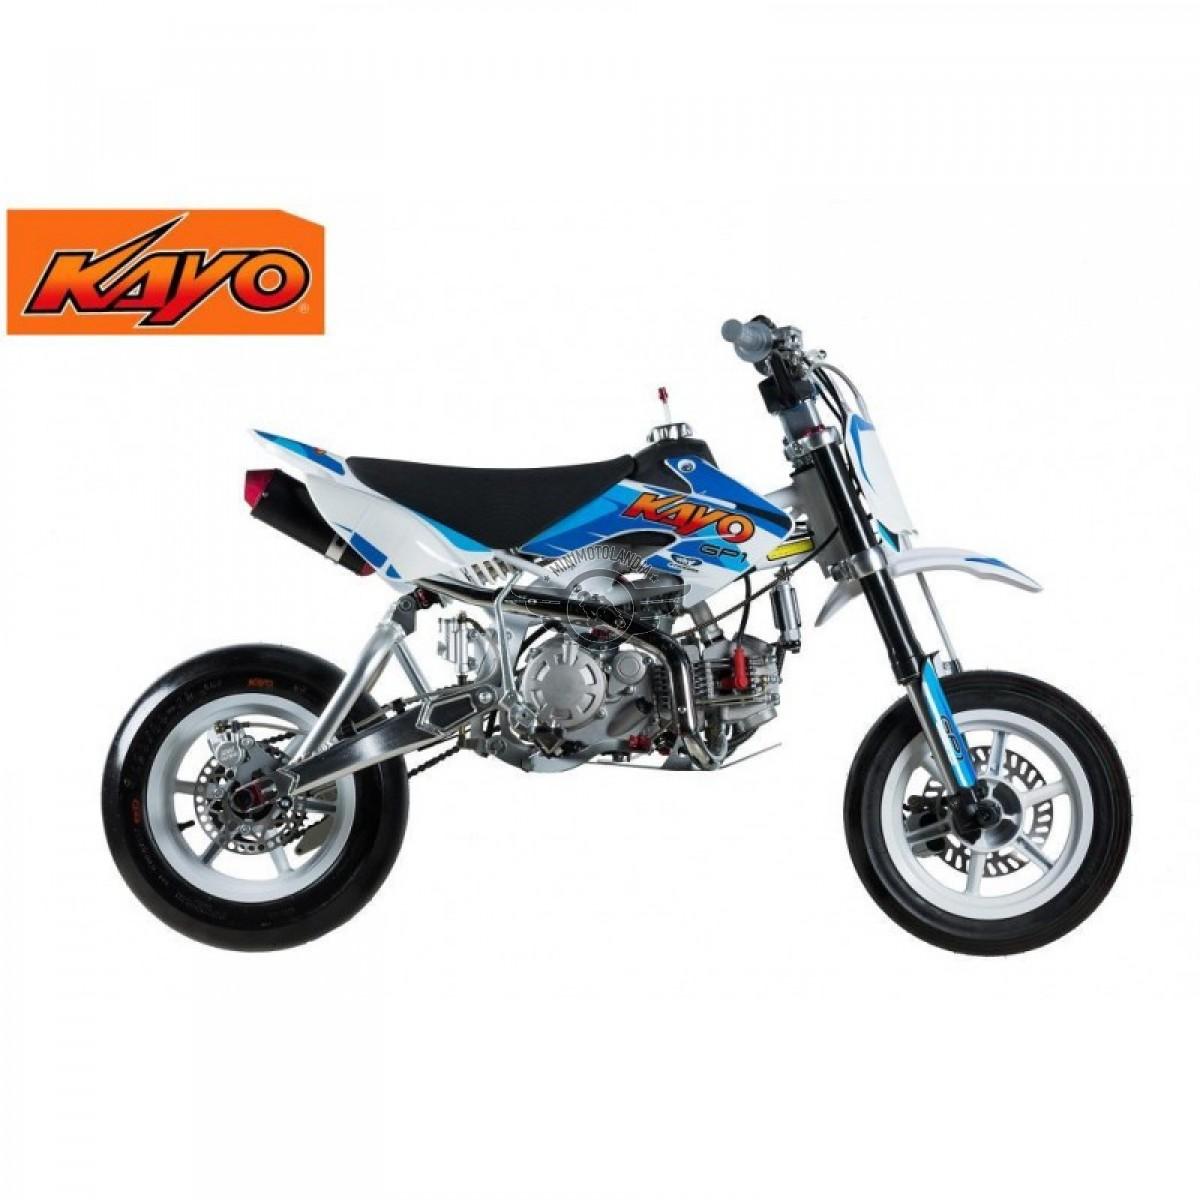 pit bike supermotard gp1 kayo 125cc motard racing minimotolandia. Black Bedroom Furniture Sets. Home Design Ideas